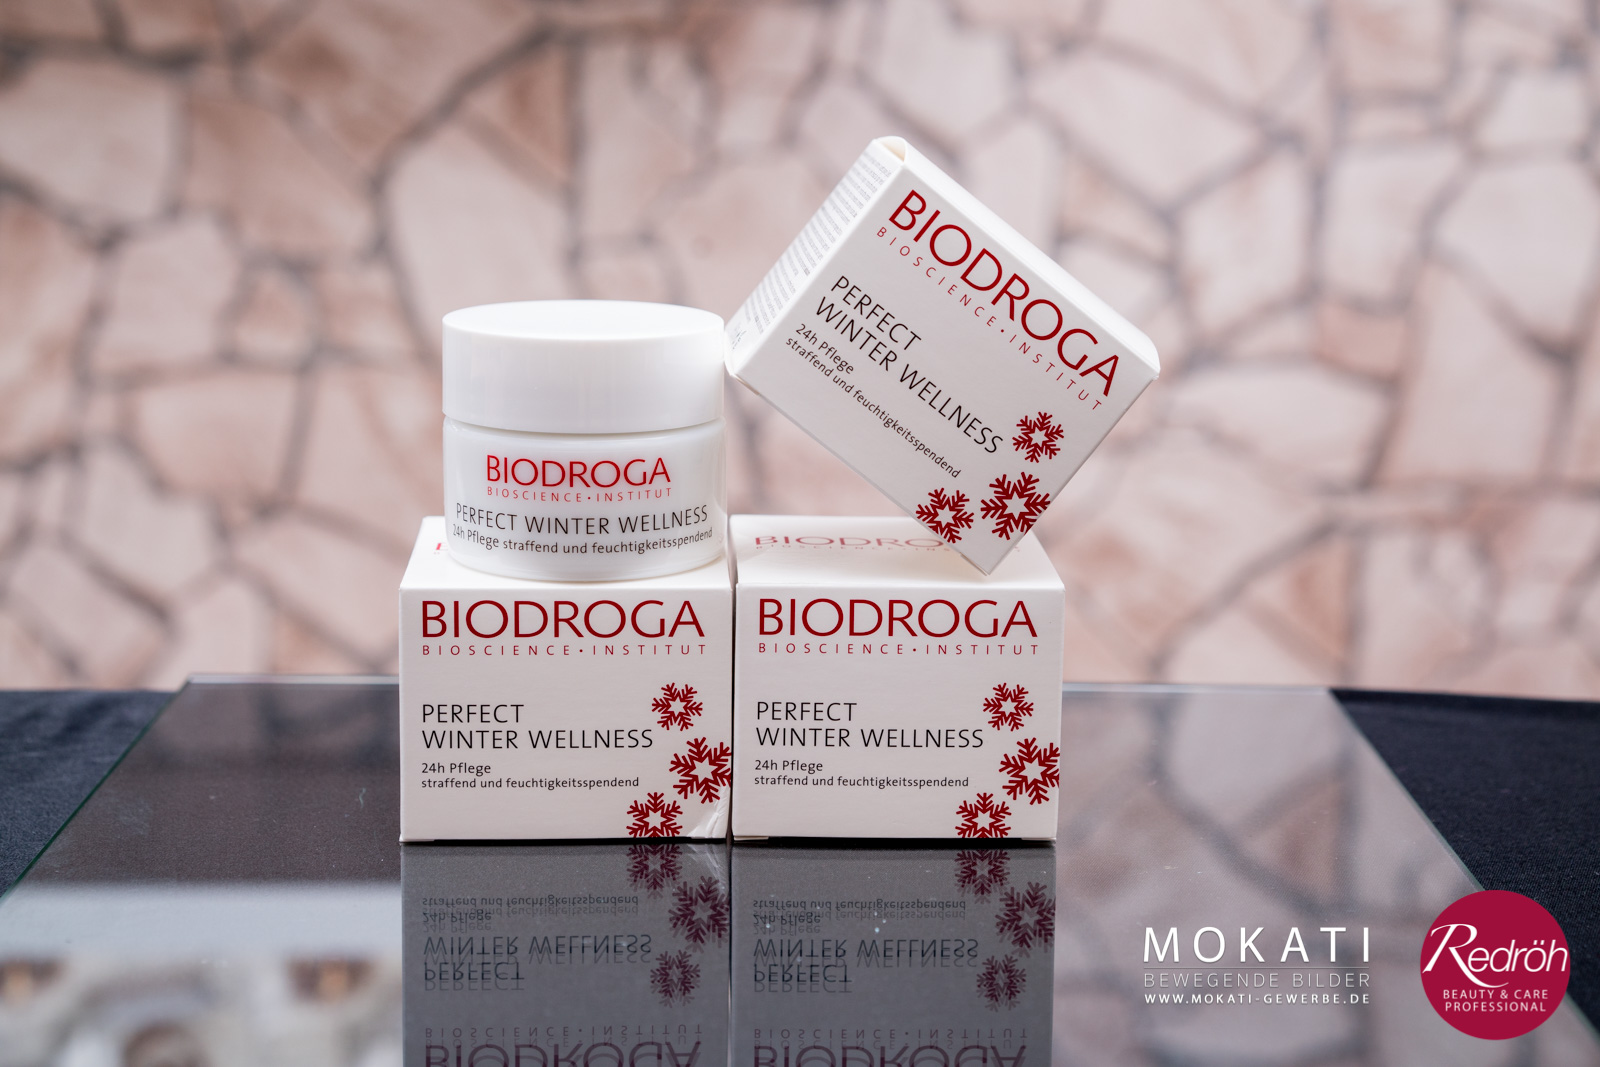 Redröh - Beauty & Care professional mit Produktaktion für November